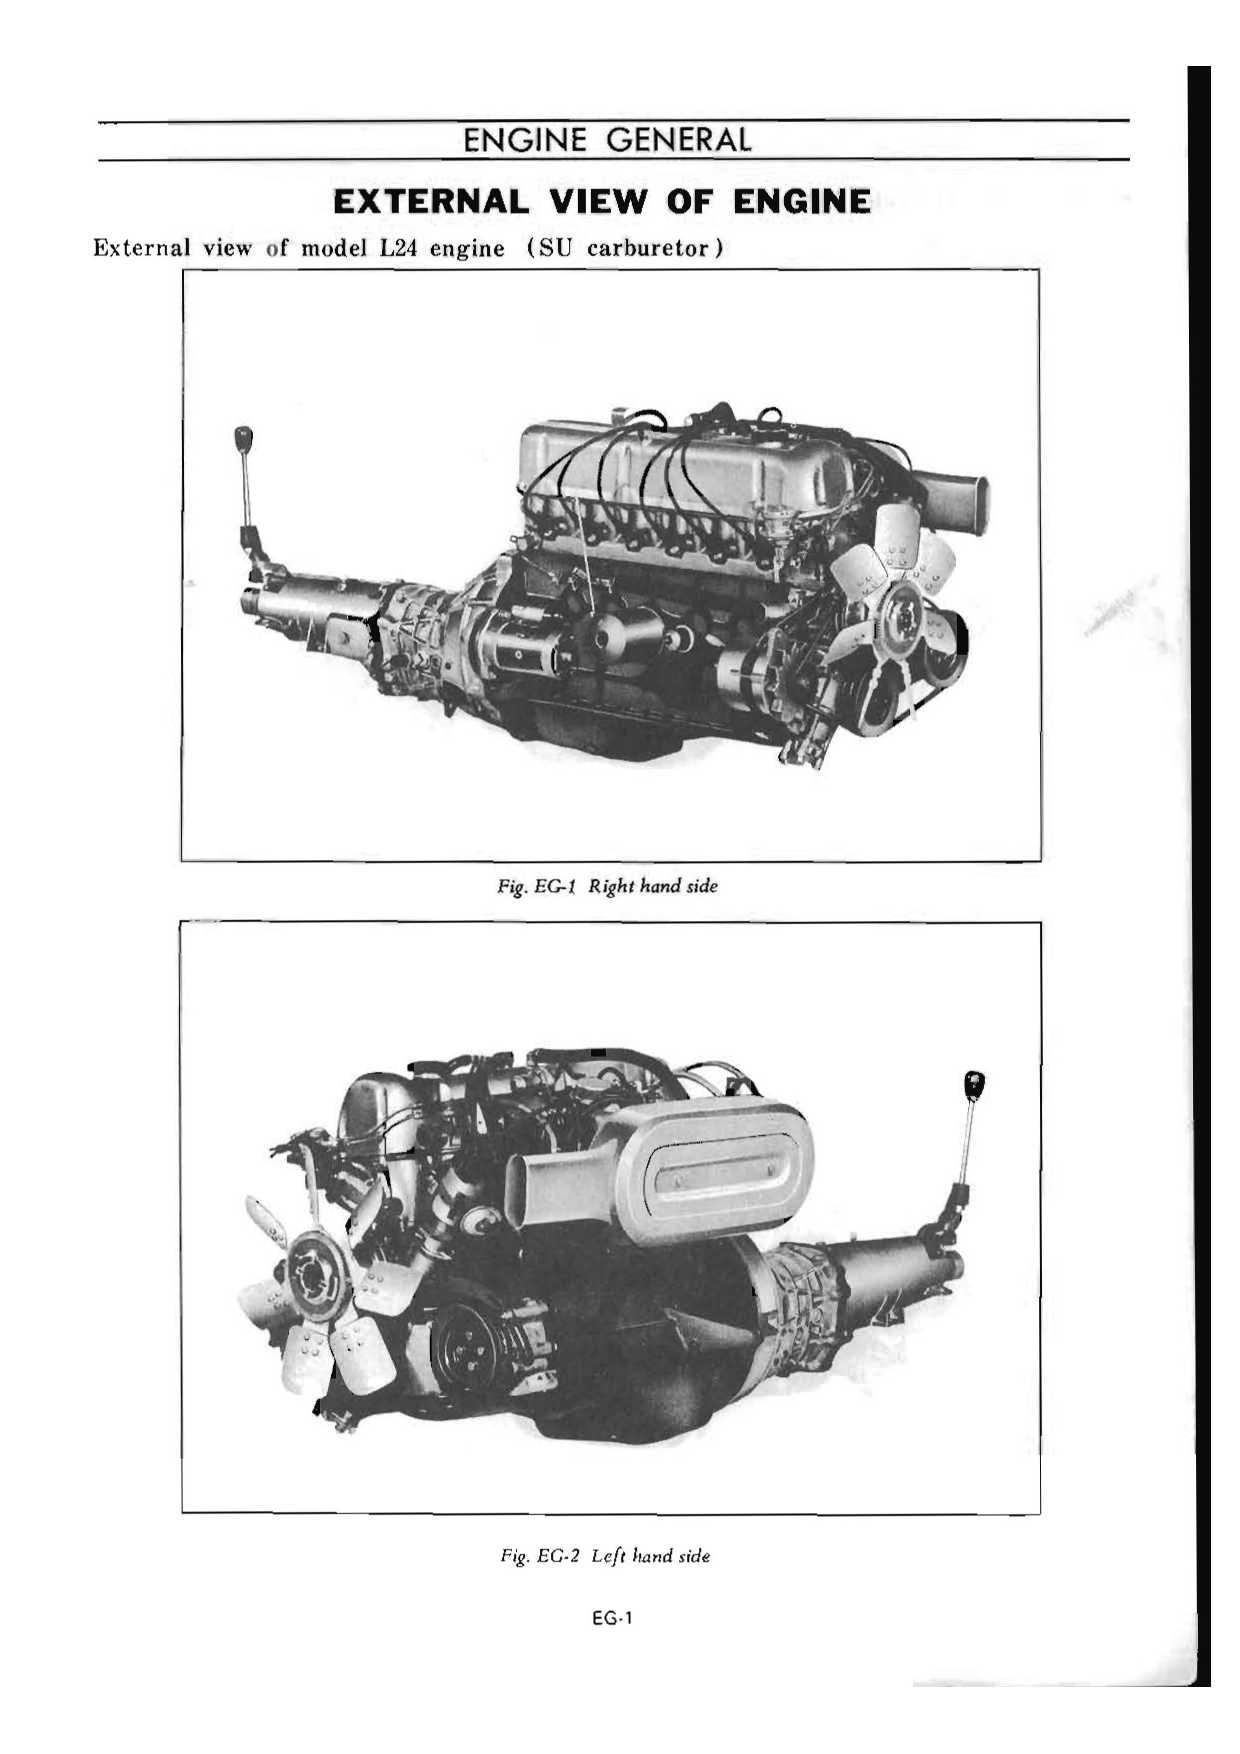 Engine General L24 Diagram Eg 02